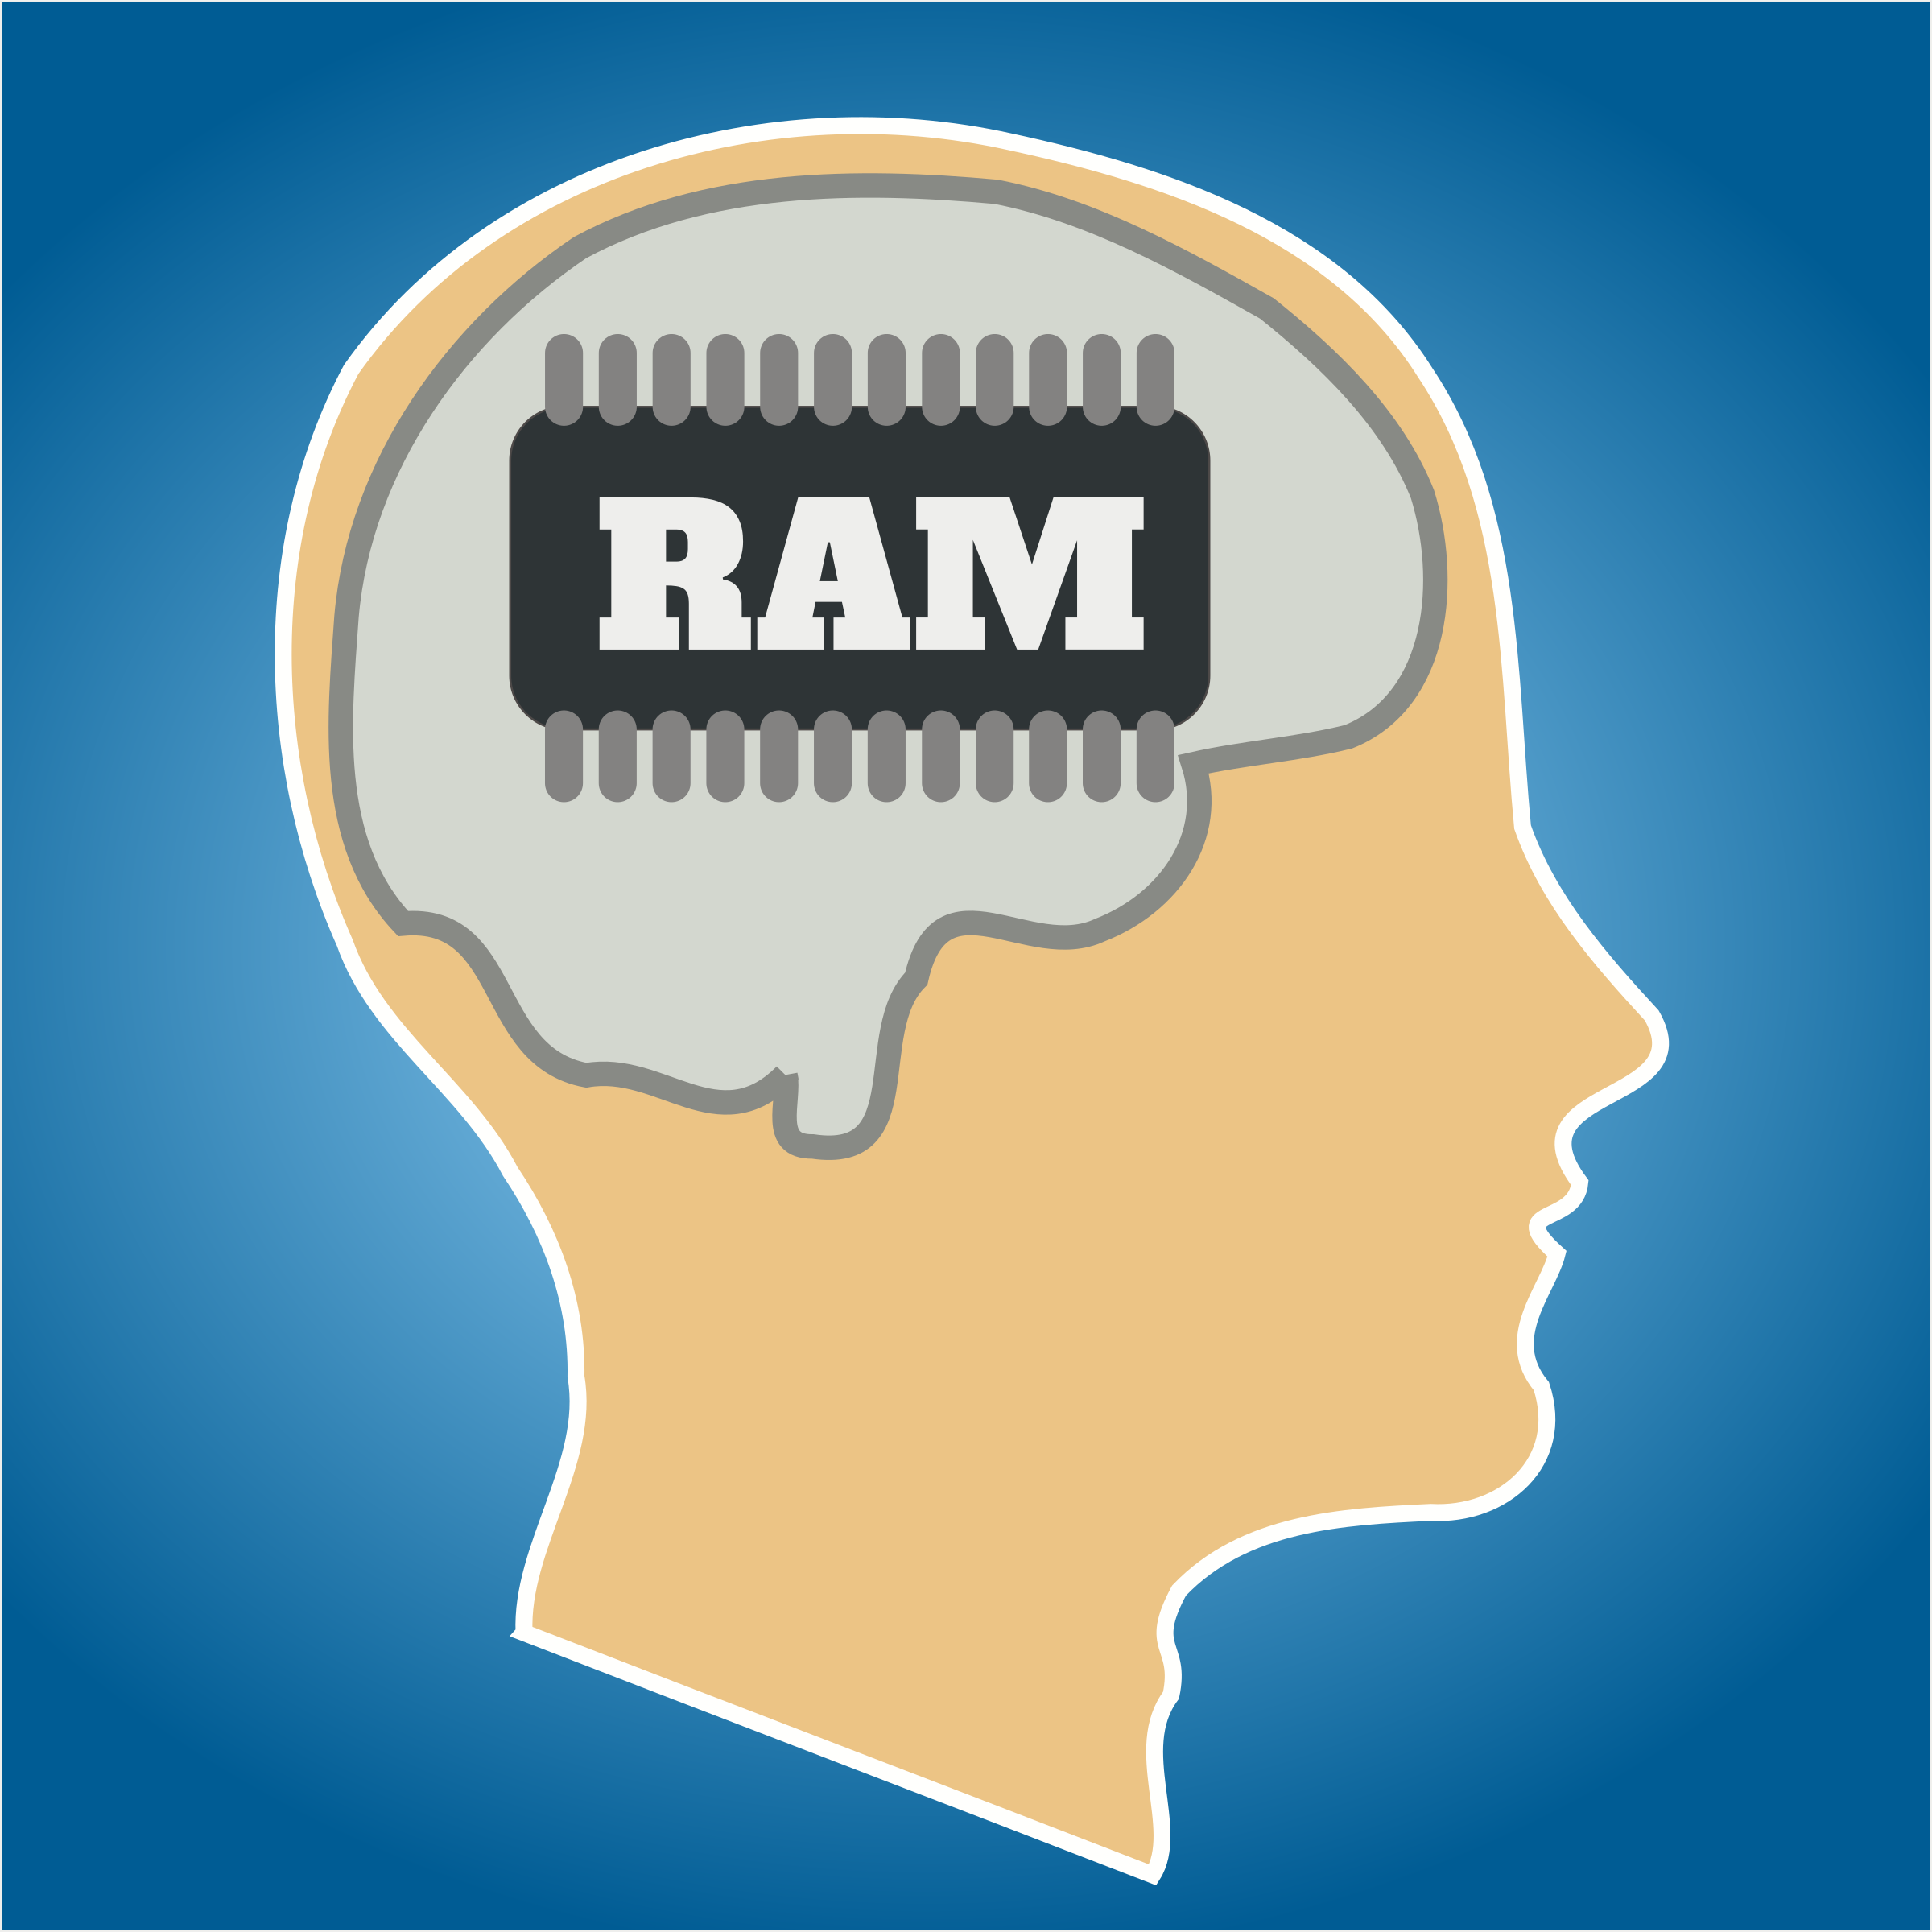 Clipart ram memory.